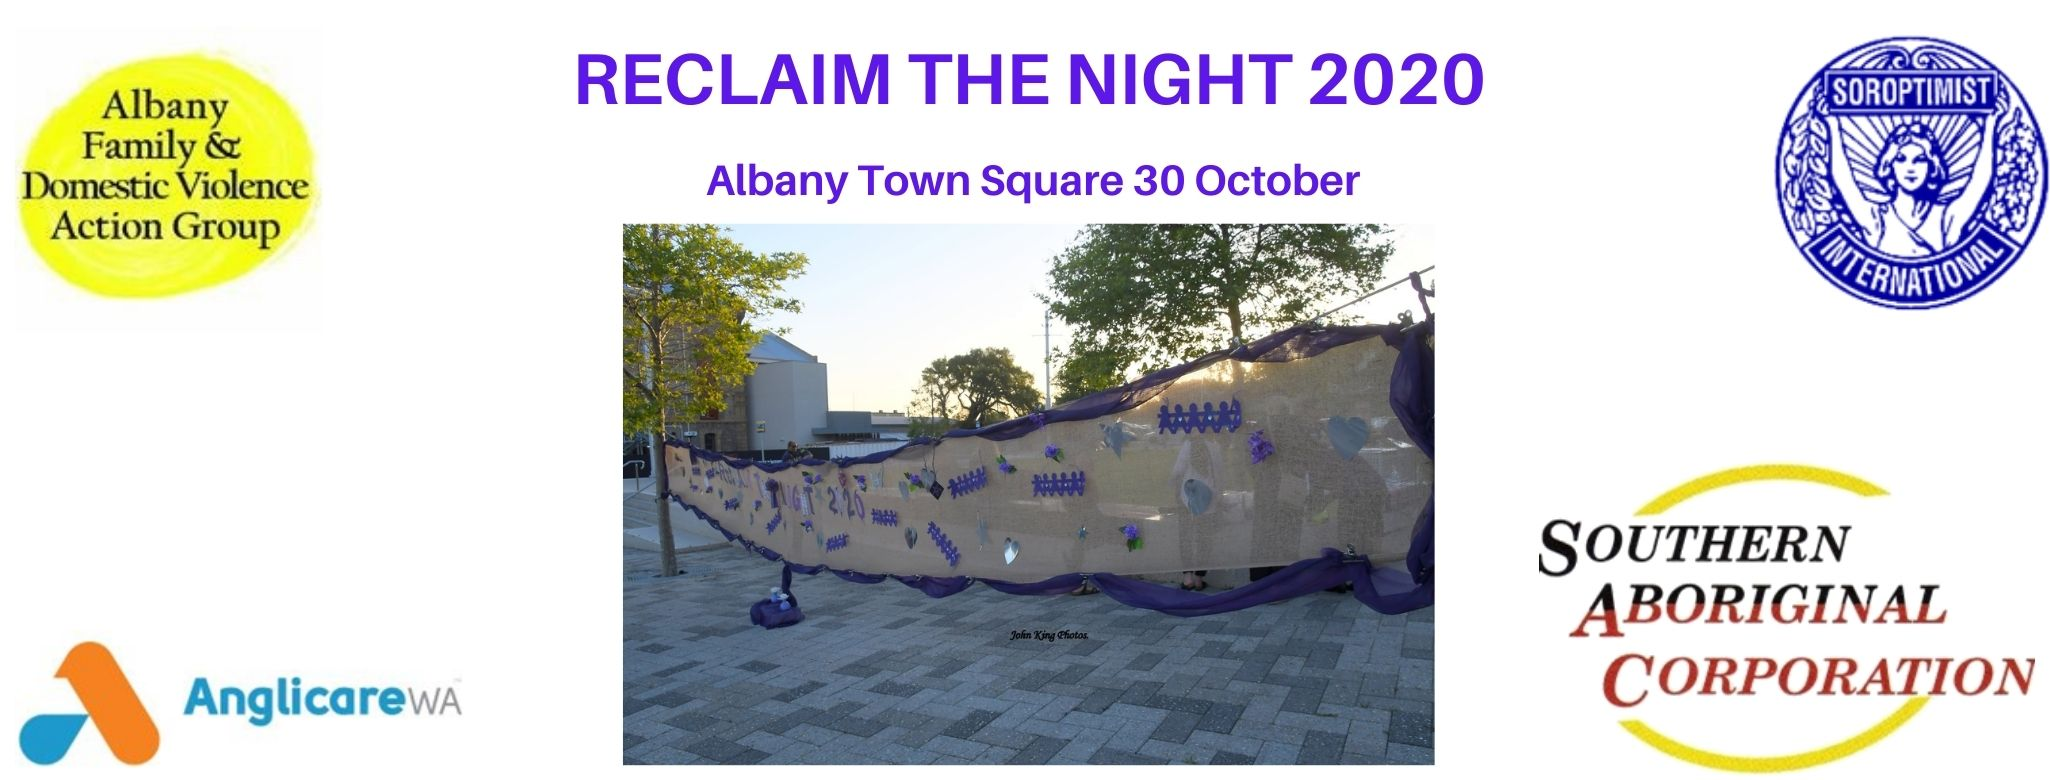 1_RECLAIM-THE-NIGHT-2020